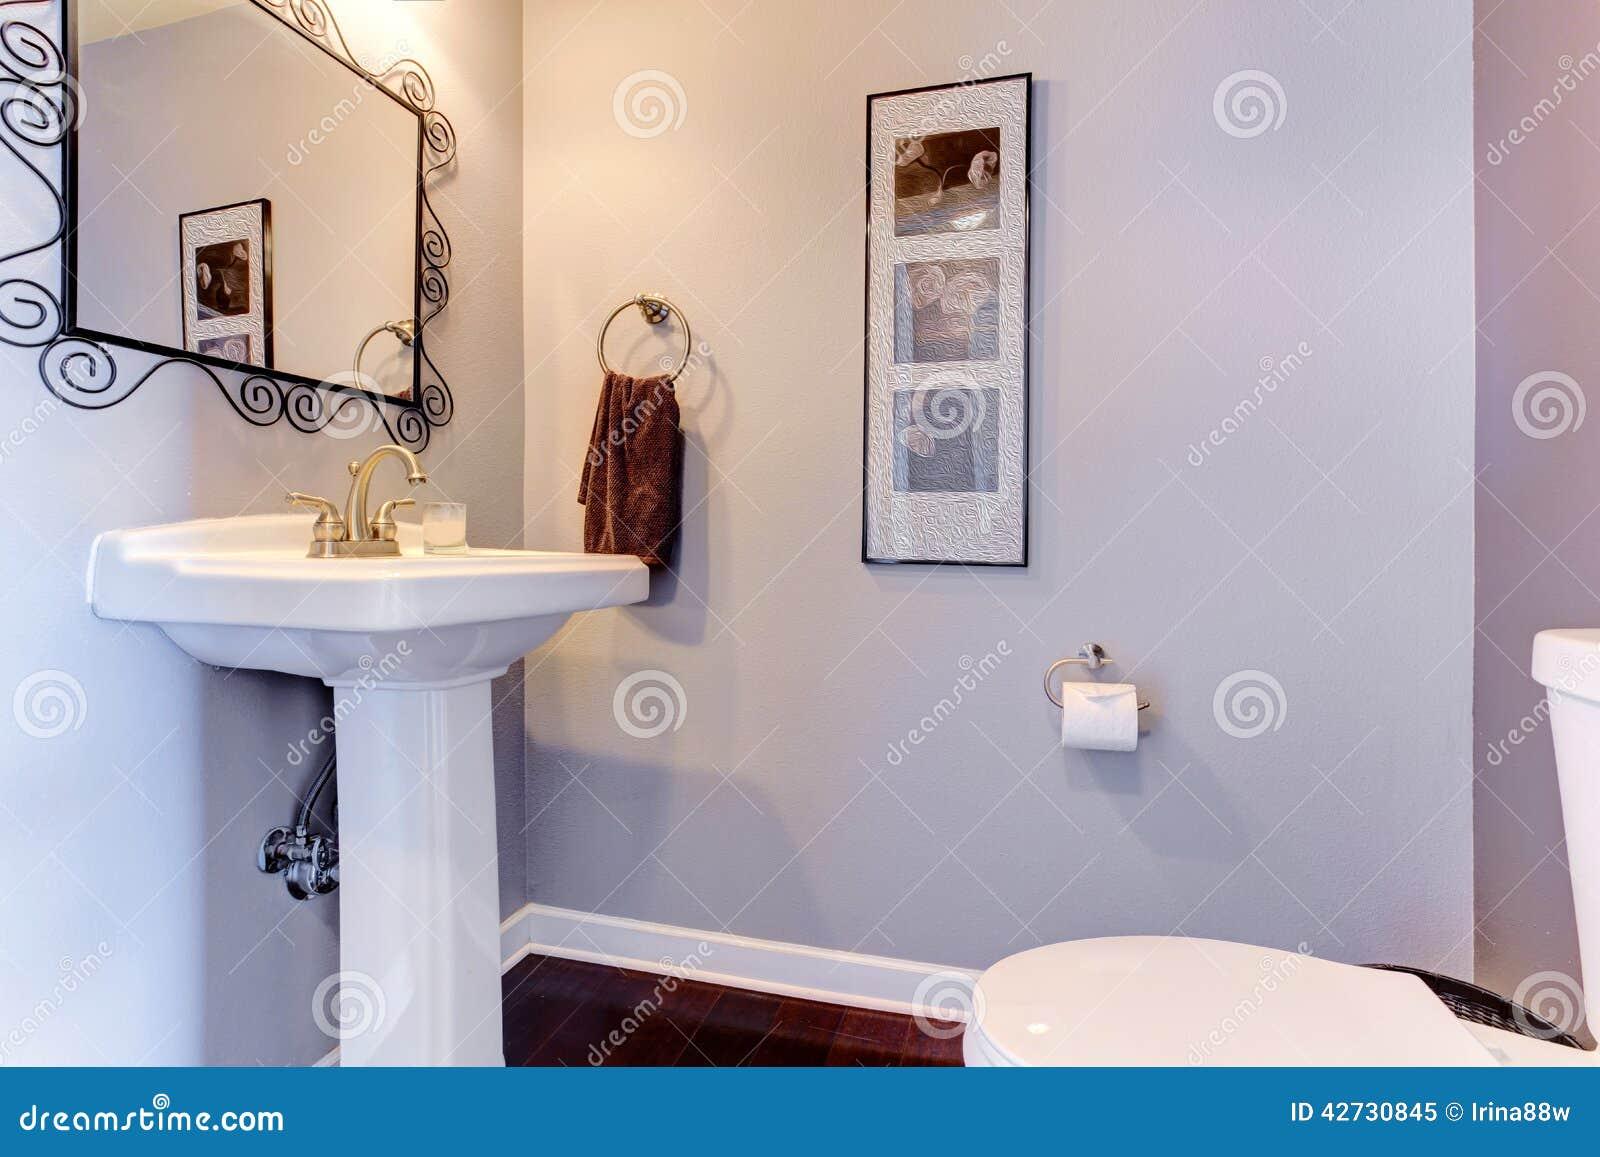 Light lavender small bathroom interior stock photo image - Lavender and white bathroom ...